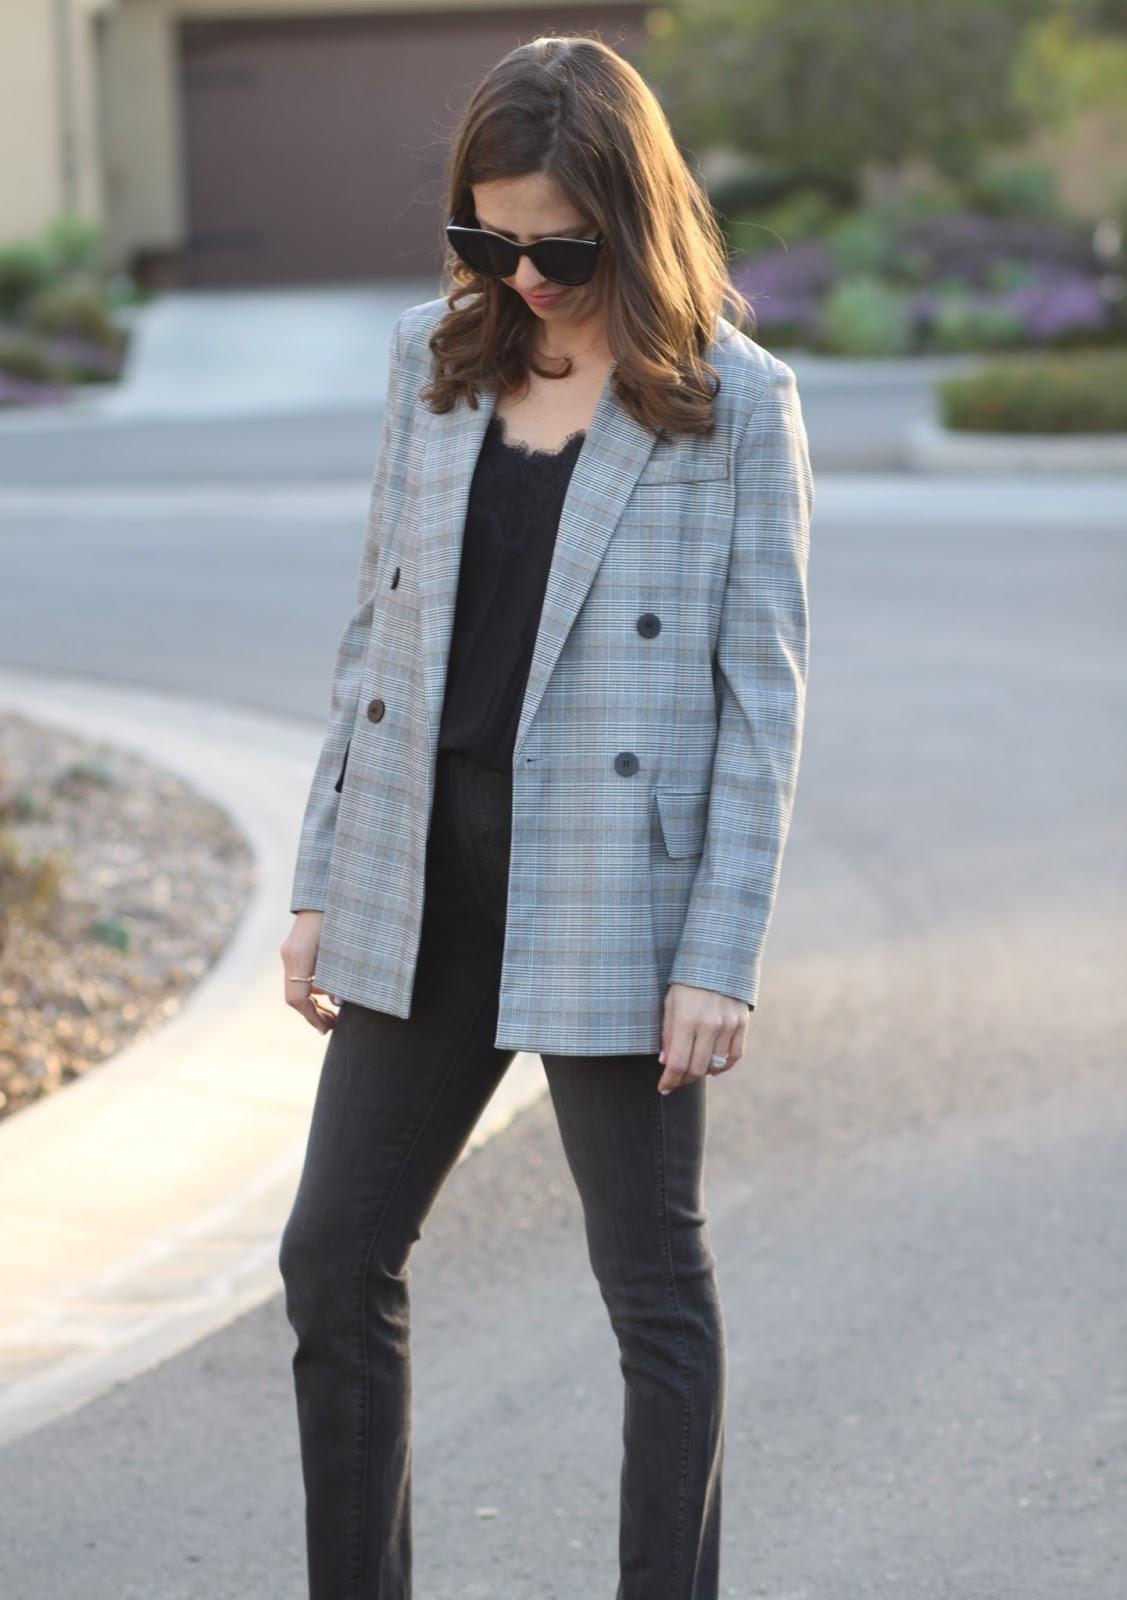 menswear blazer outfit